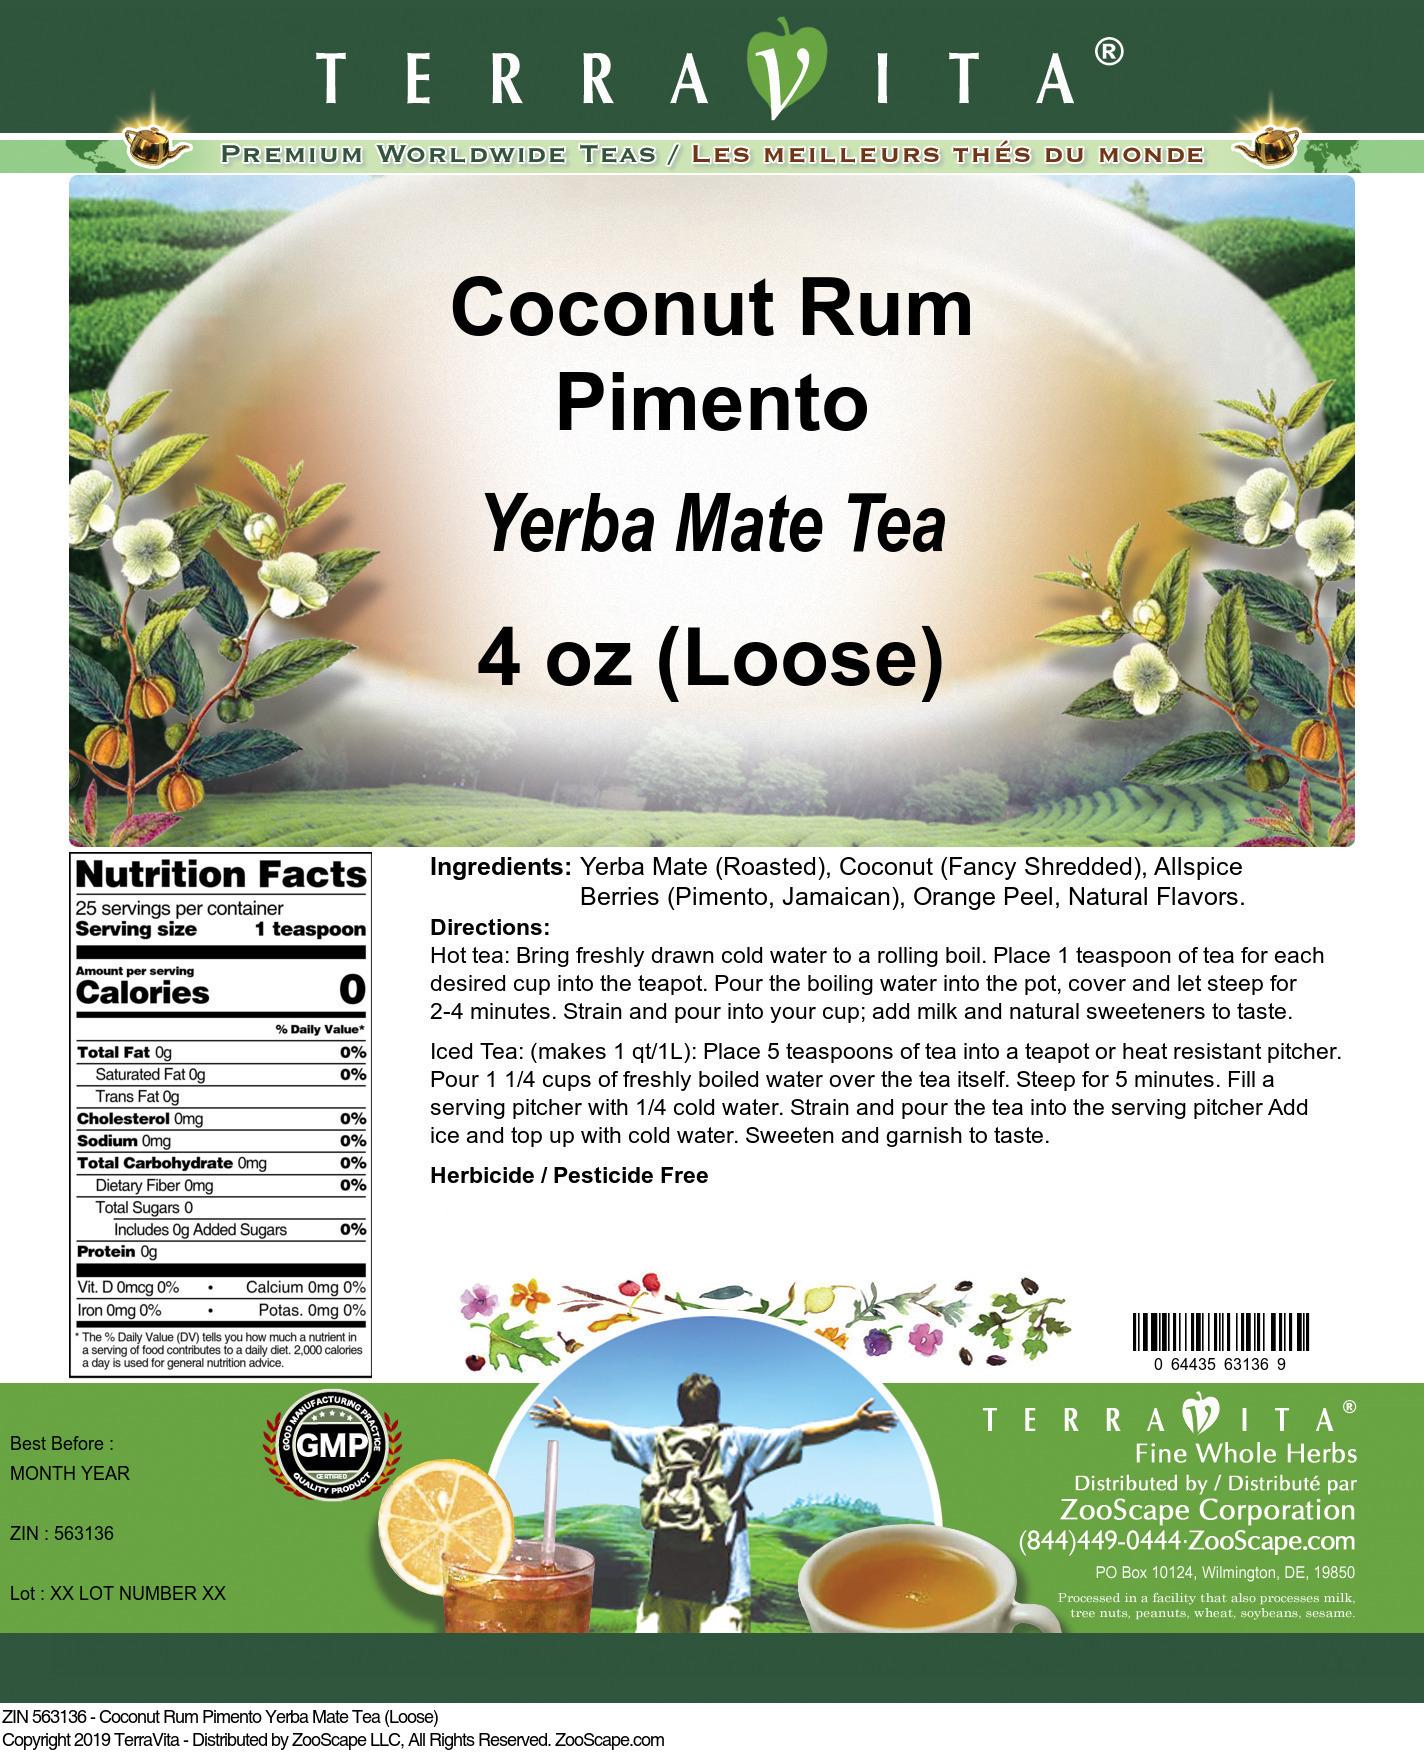 Coconut Rum Pimento Yerba Mate Tea (Loose)